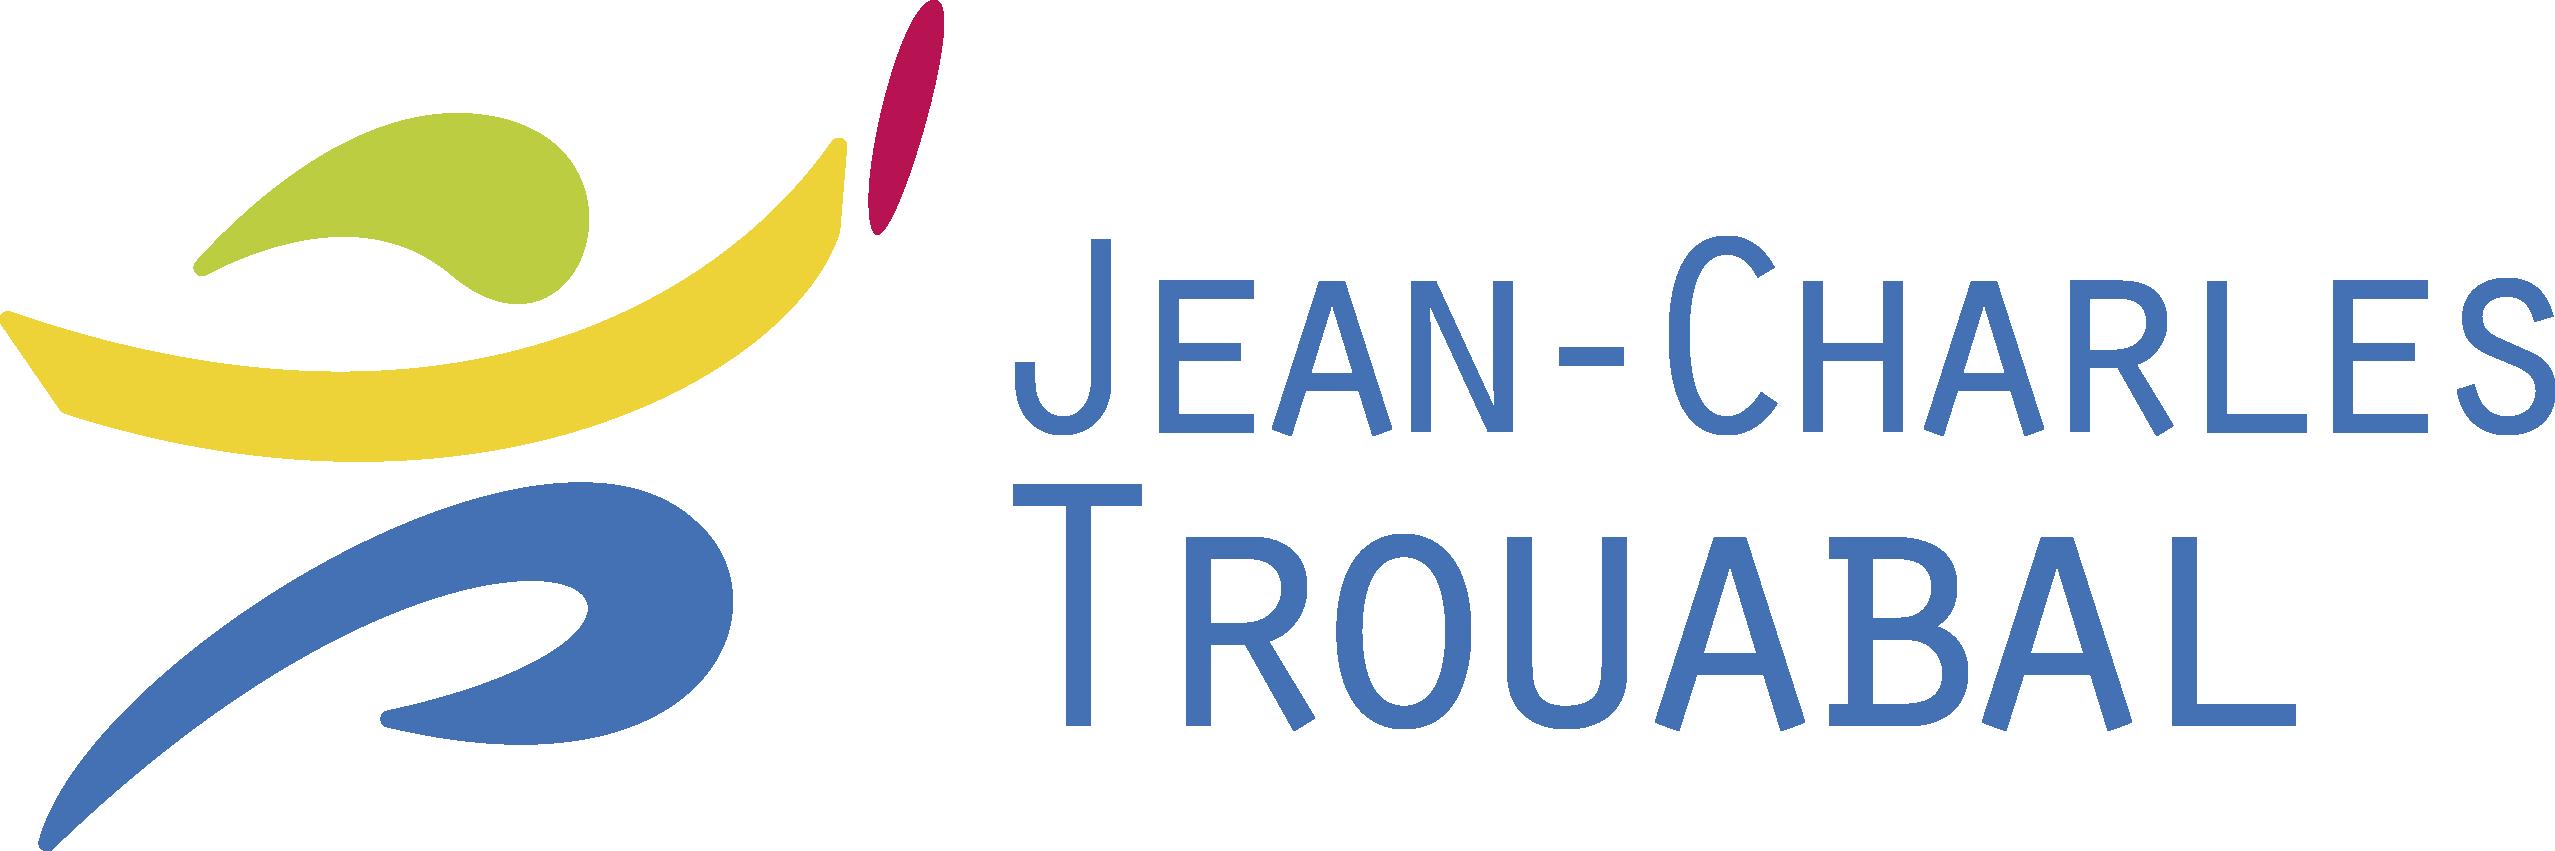 Jean Charles Trouabal